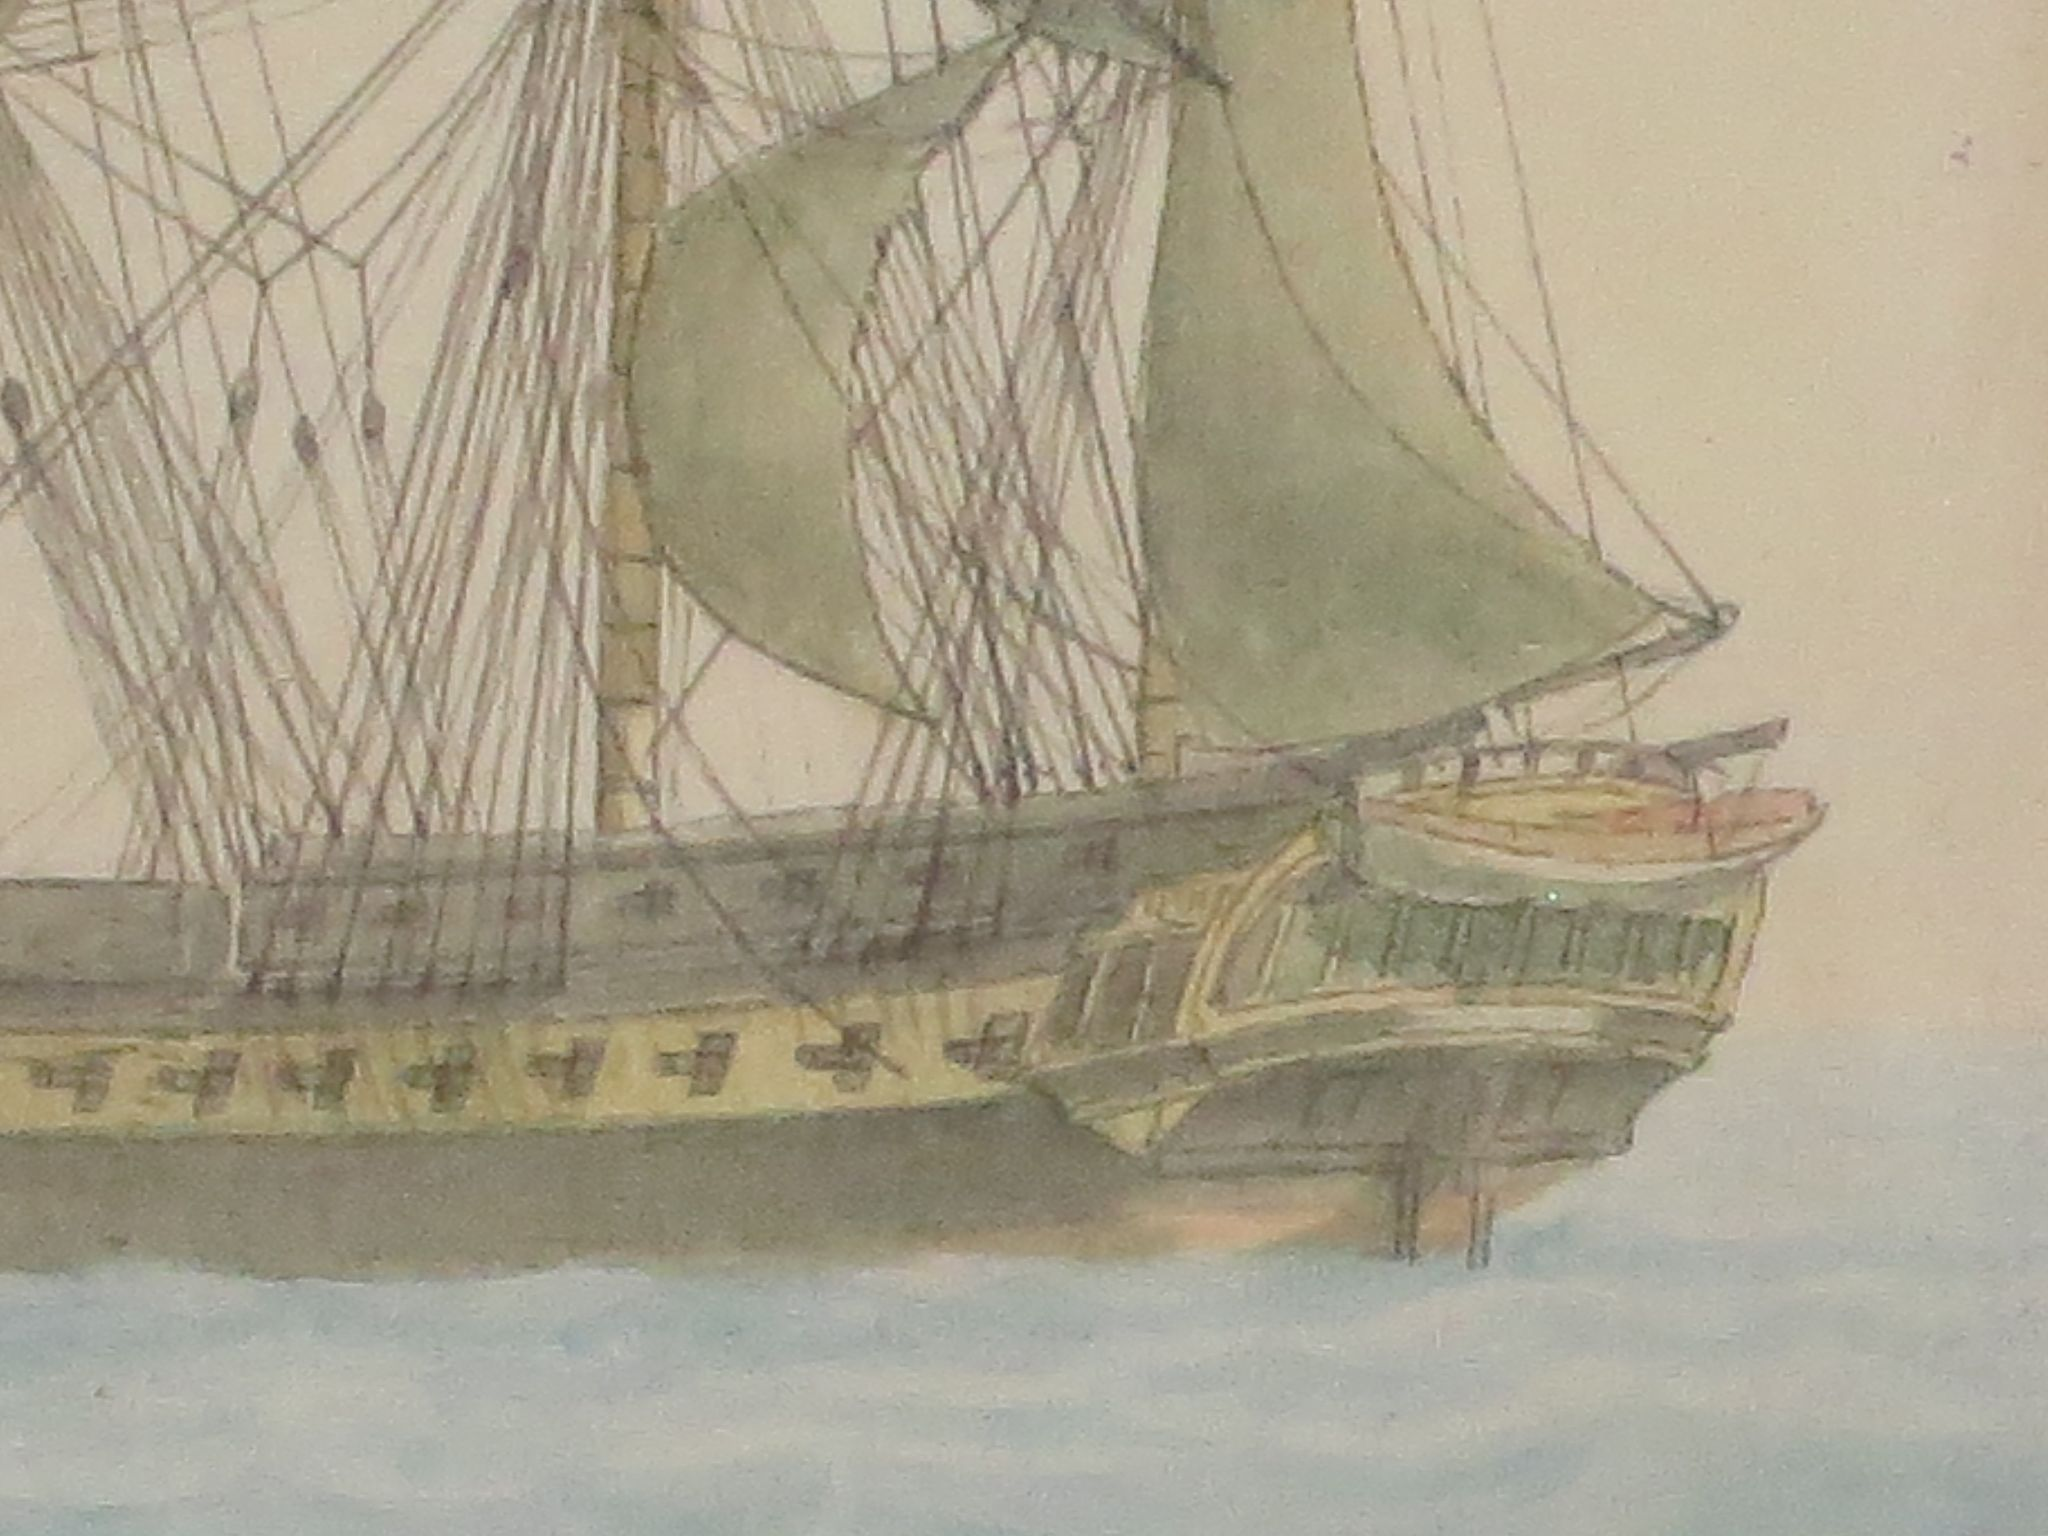 JOSEPH-ANGE ANTOINE ROUX (FRENCH, 1765-1835) - Image 12 of 15